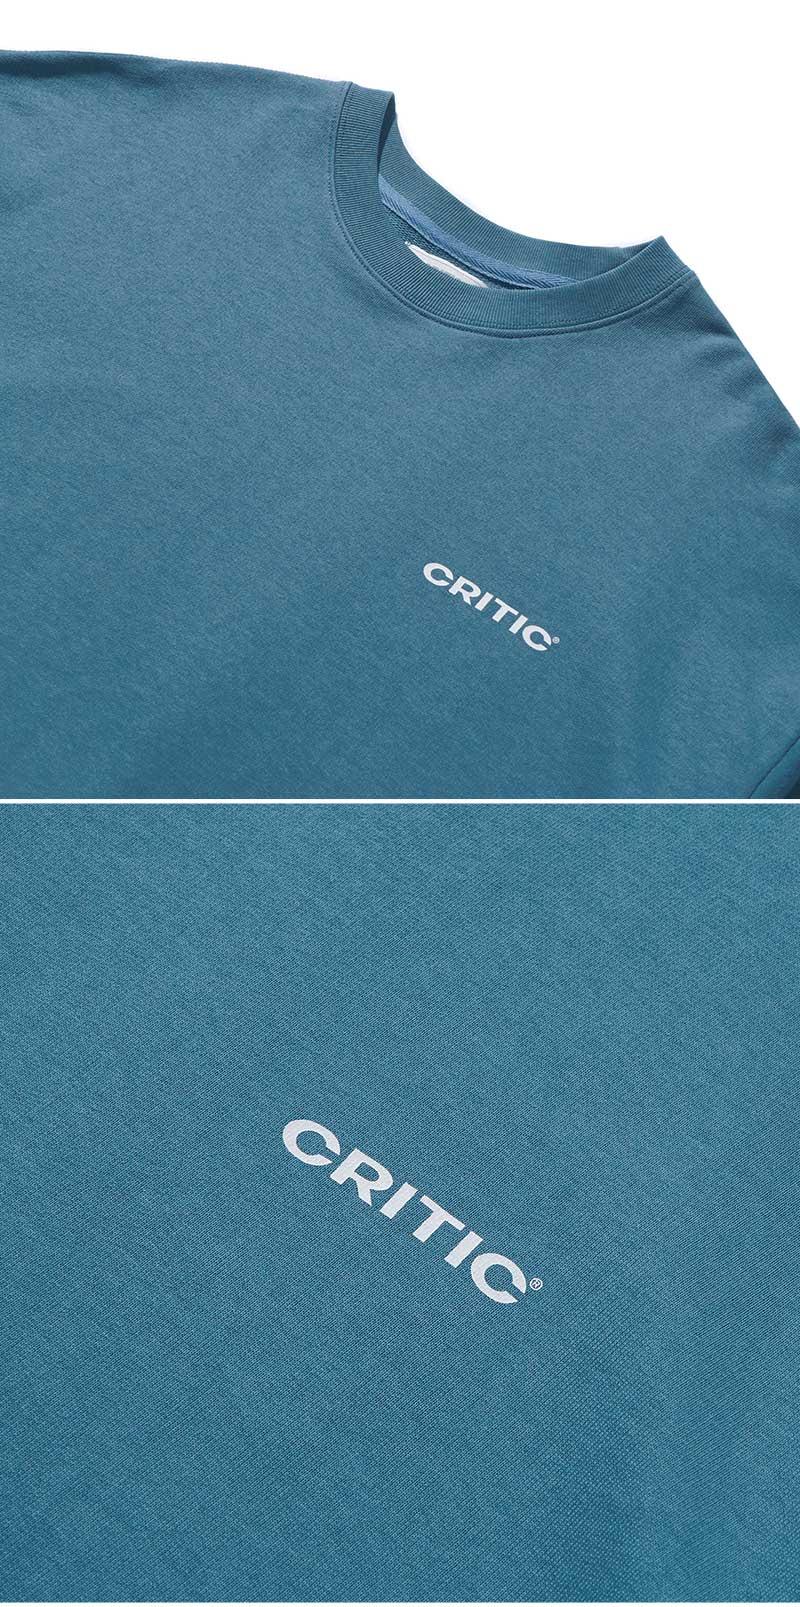 BACKSIDE LOGO SWEATSHIRT(BLUE GREEN)_CTONICR03UB7